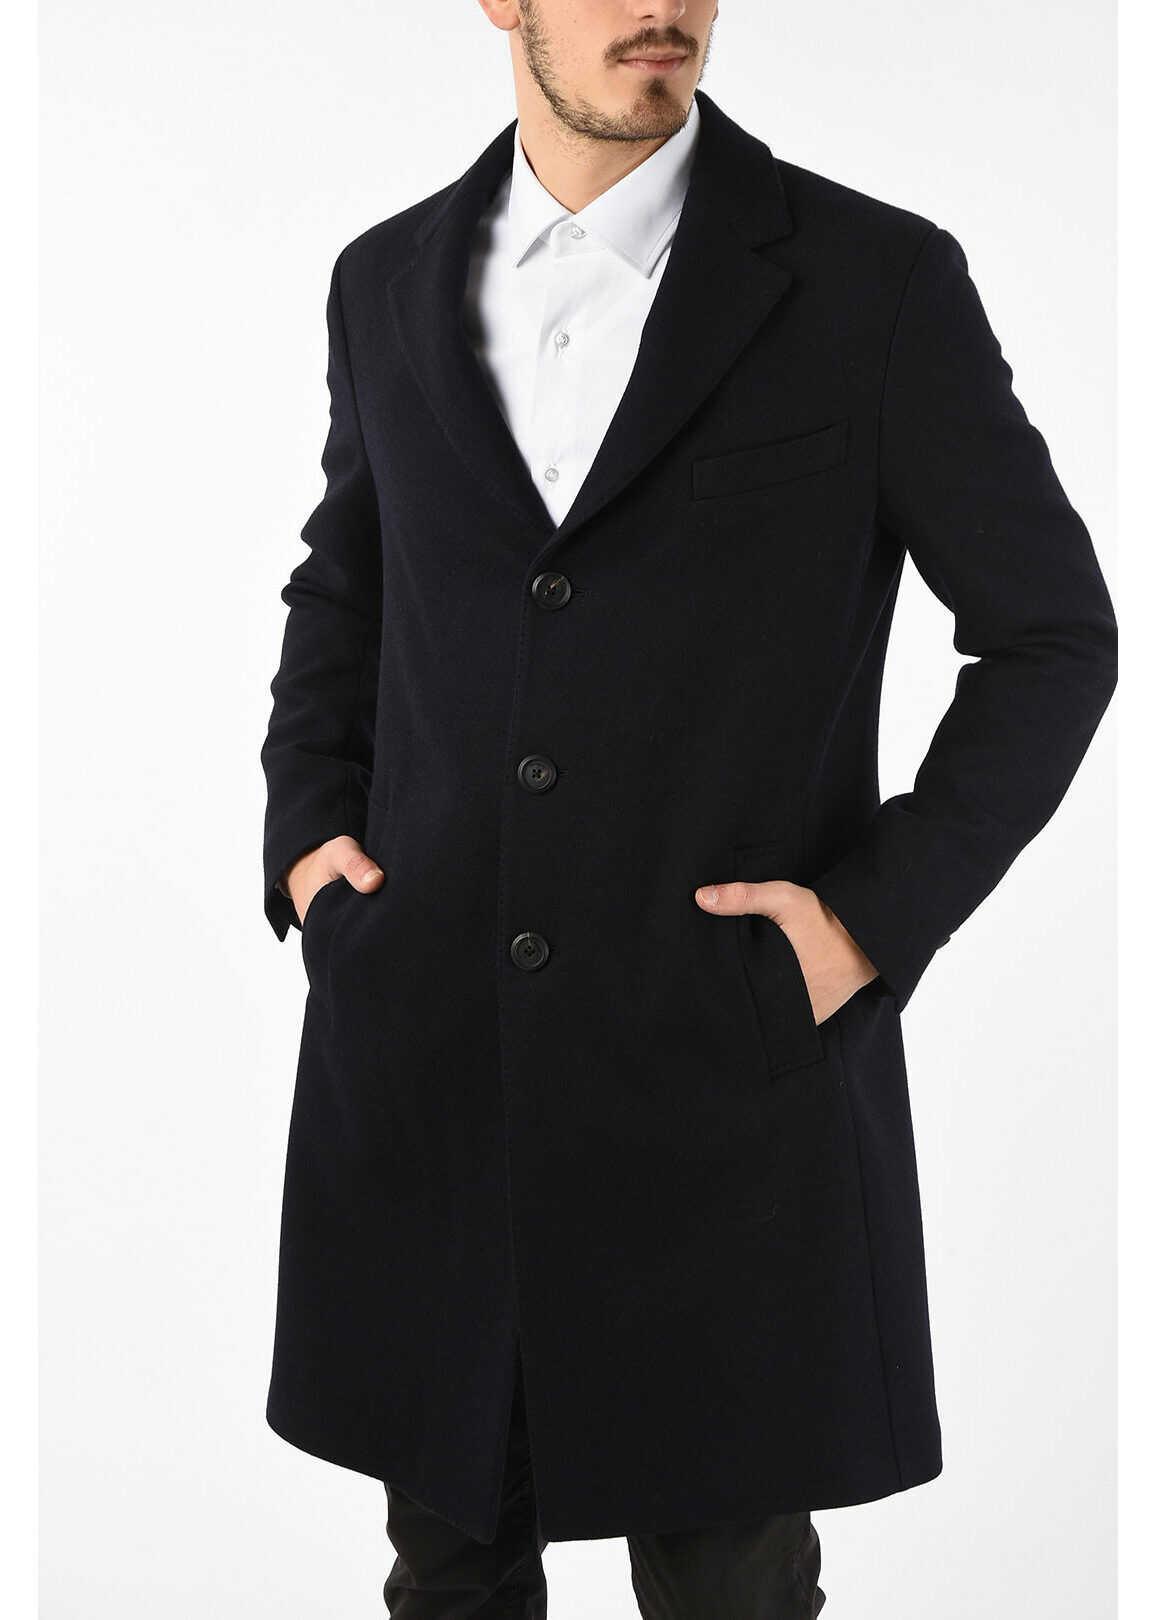 Salvatore Ferragamo Virgin Wool and Cashmere Notch Lapel Coat BLUE imagine